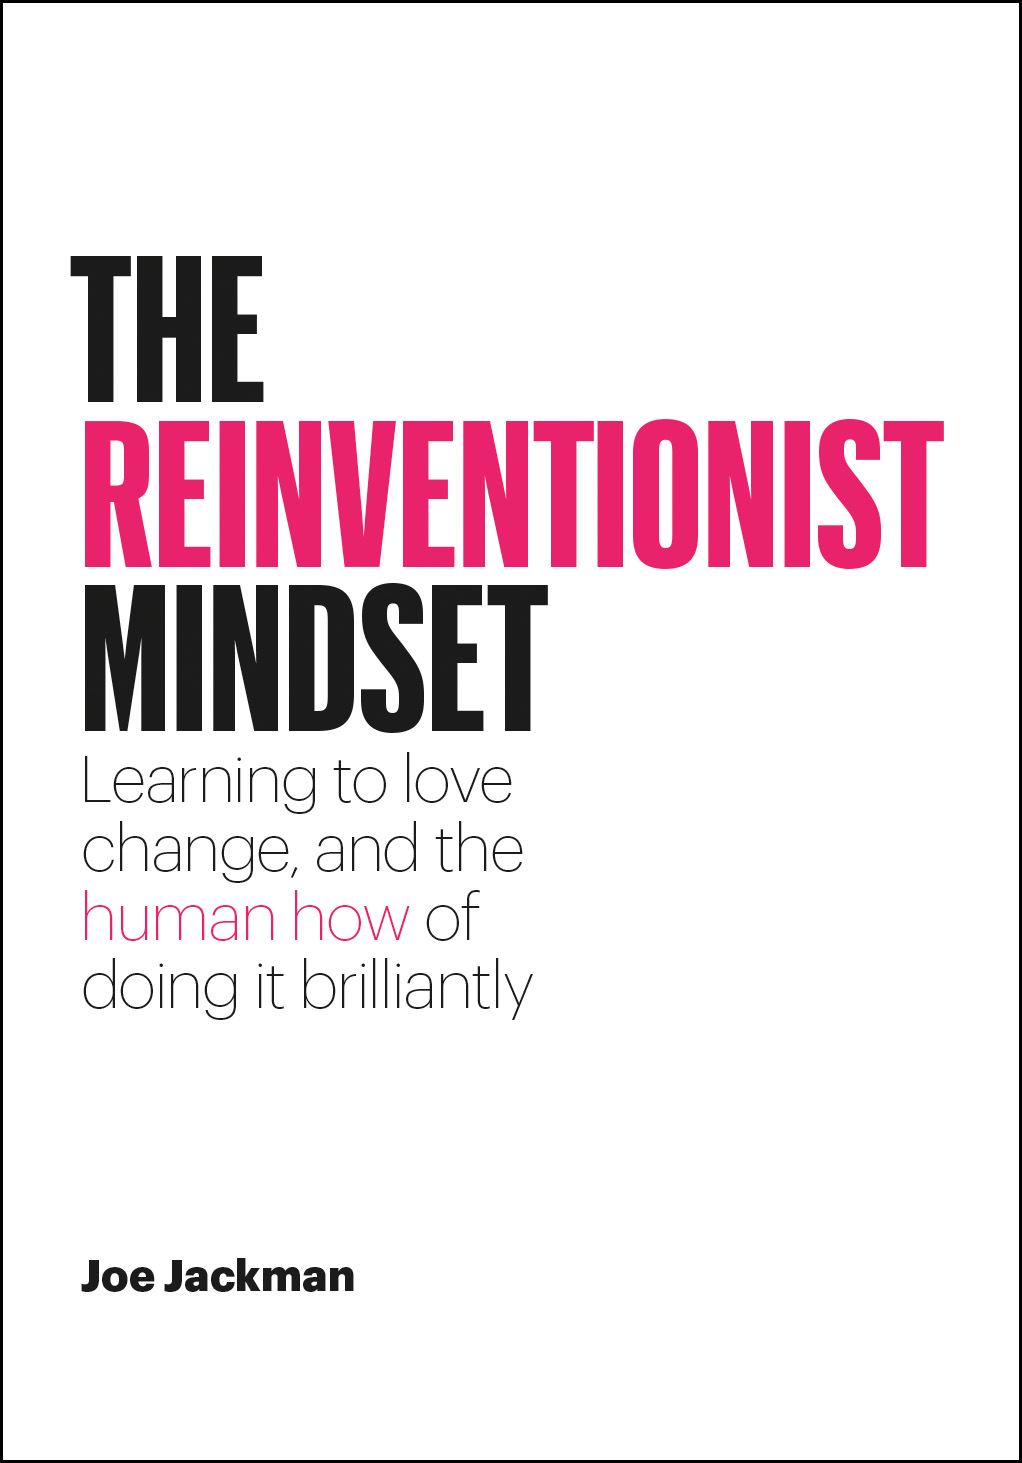 The Reinventionist Mindset